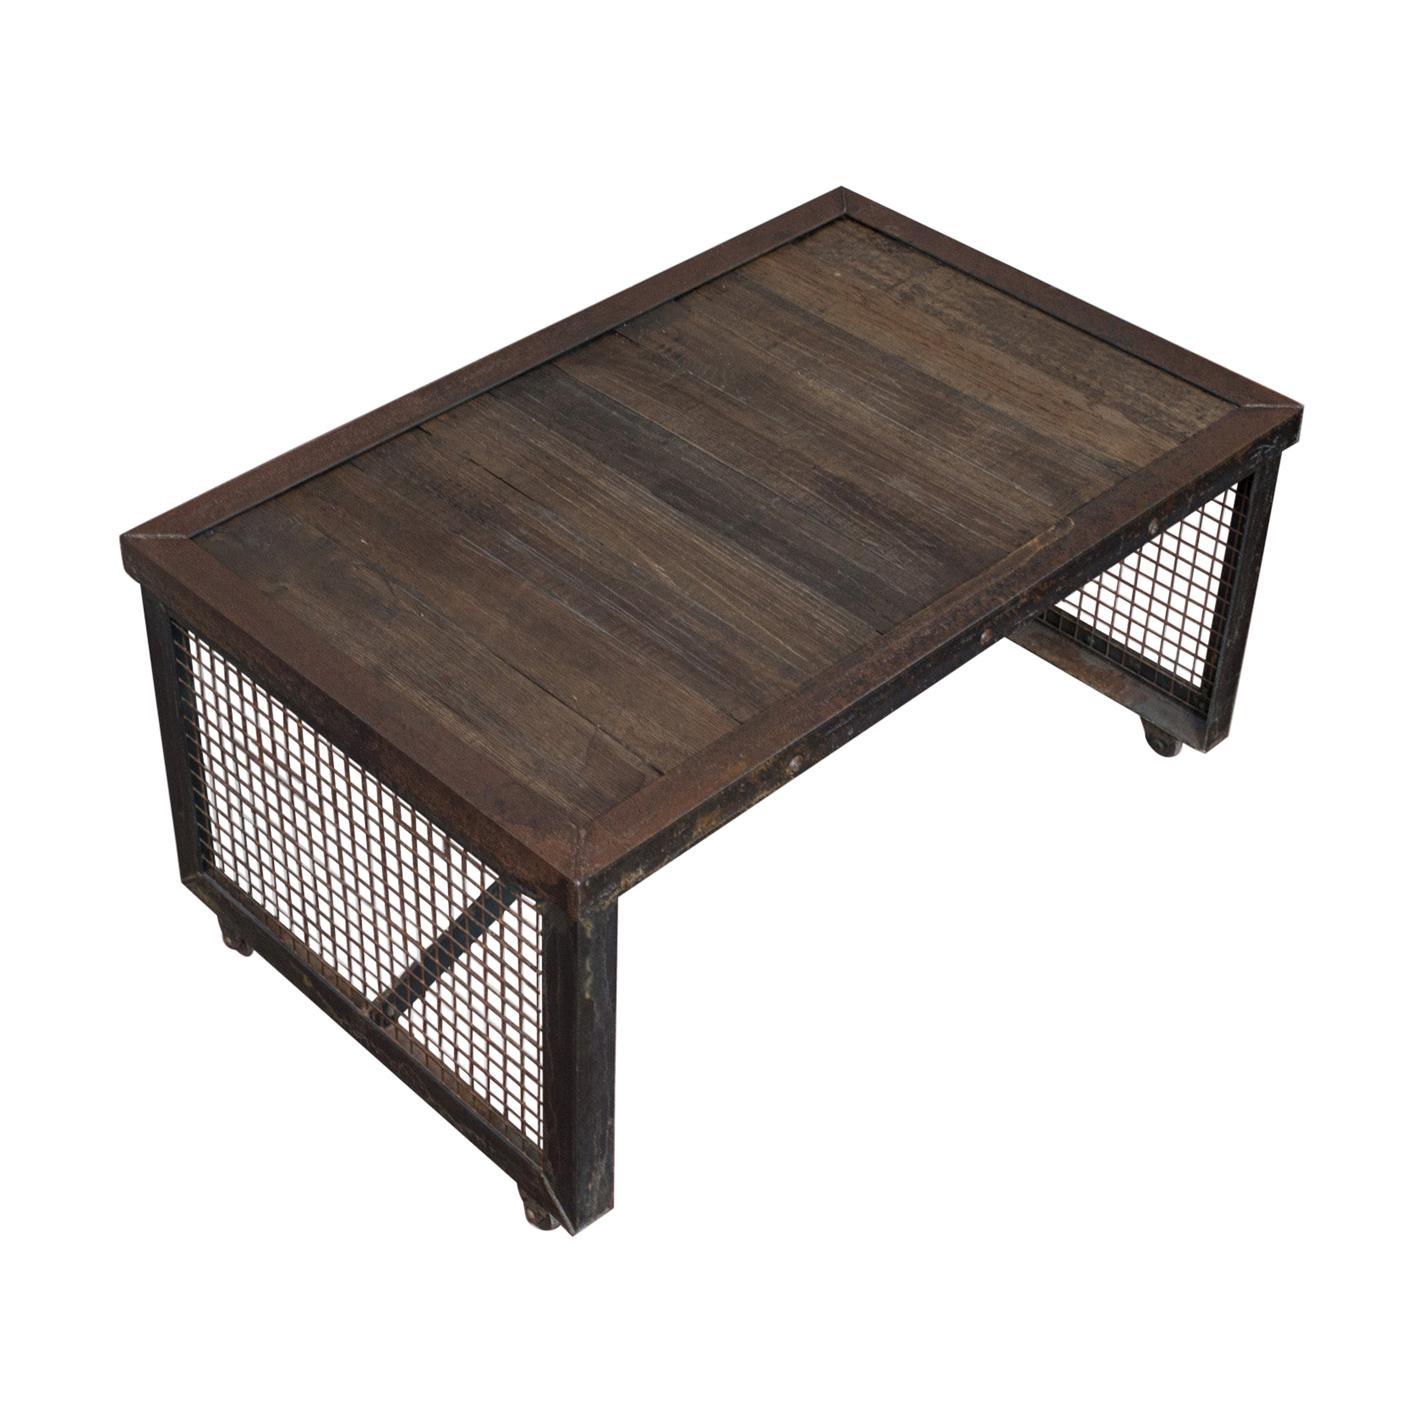 Vintage Coffee Table, Industrial Taste, English, Steel, Oak, 20th Century